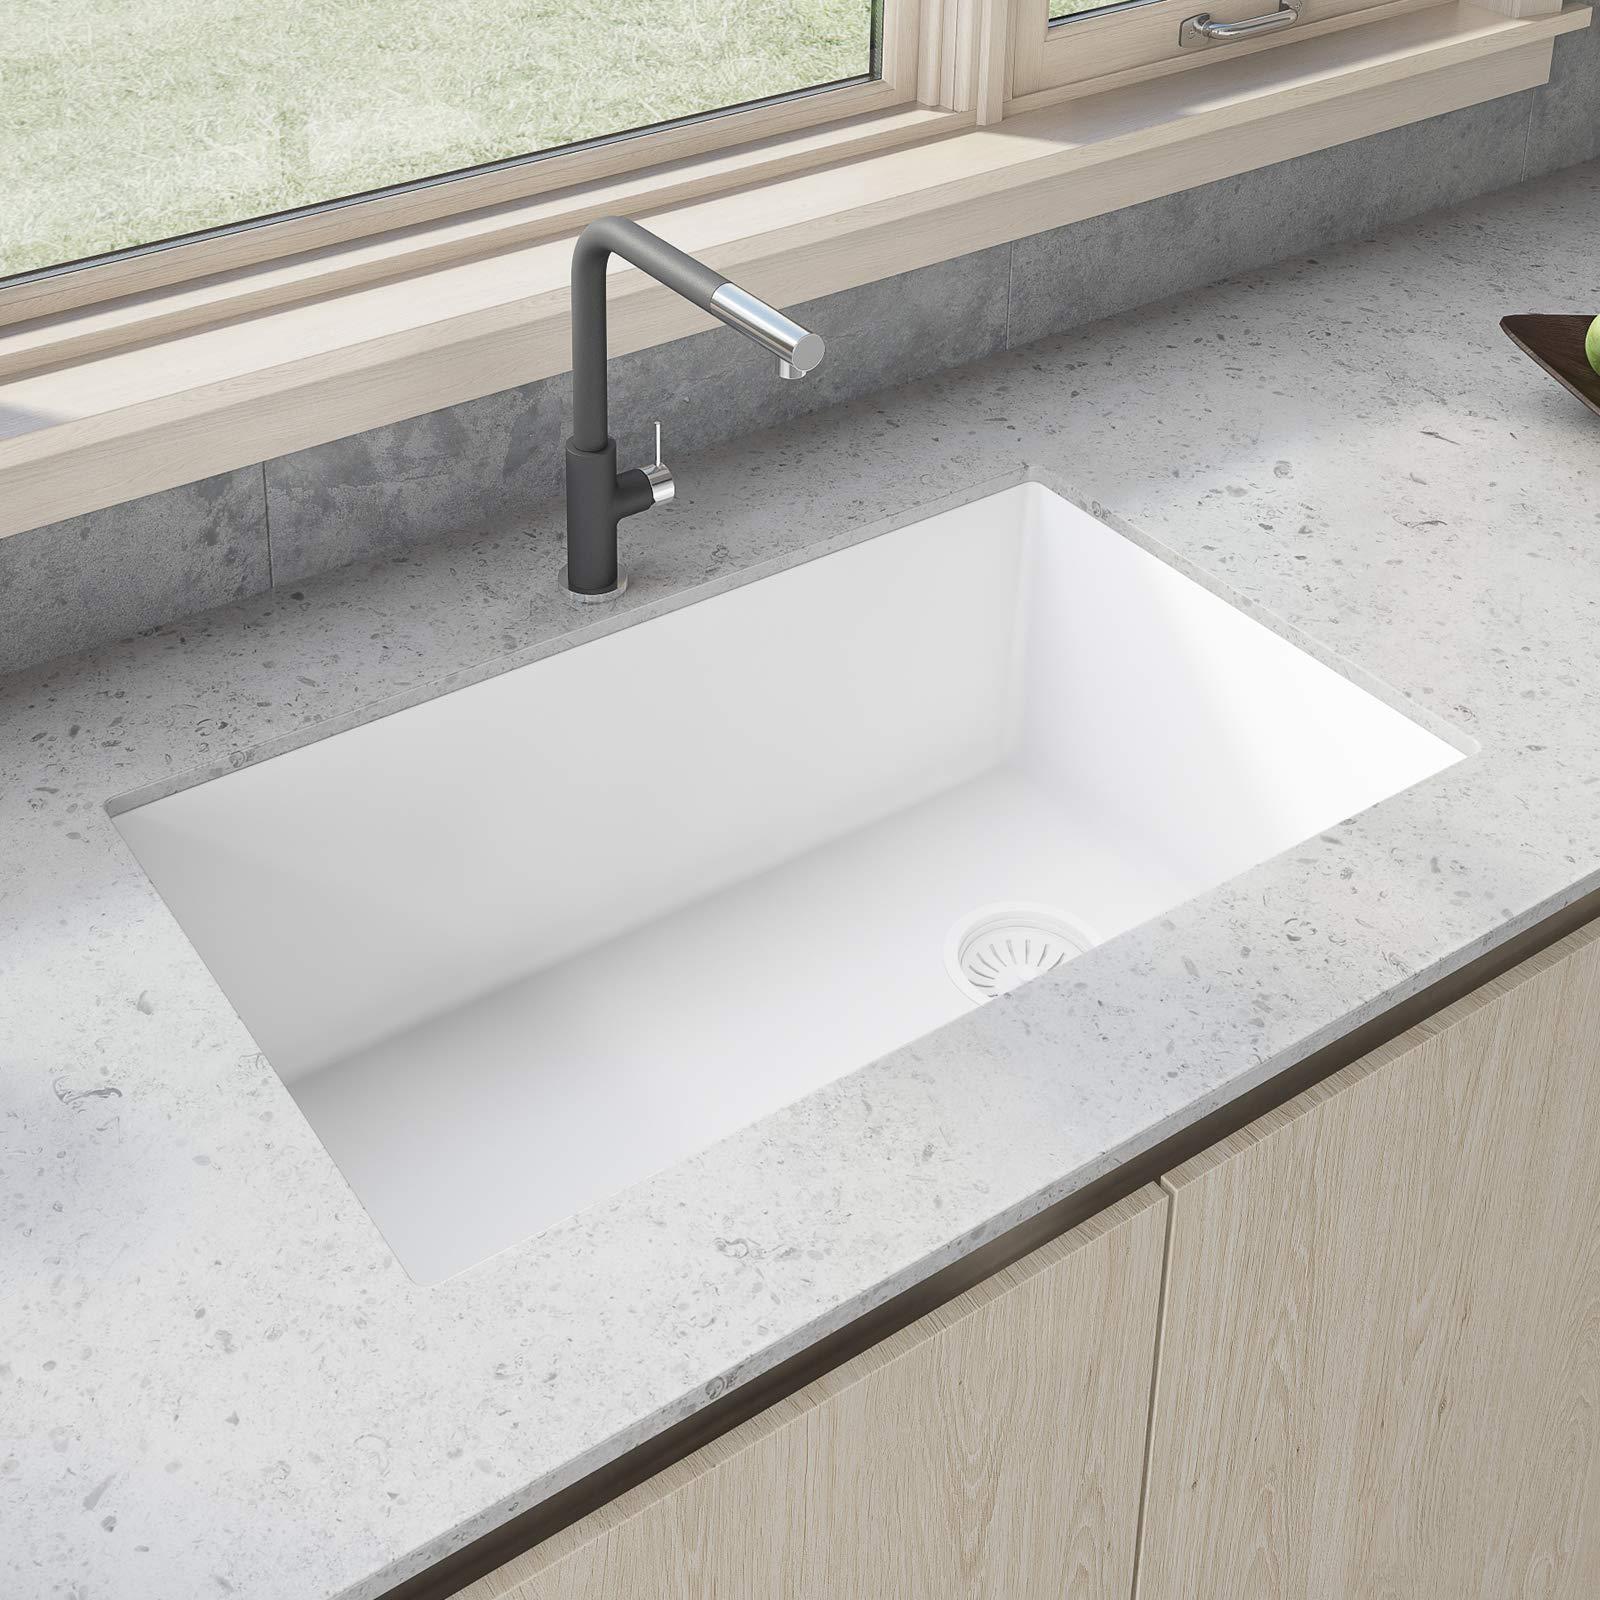 Ruvati 32 X 19 Inch Undermount Granite Composite Single Bowl Kitchen Sink Arctic White Rvg2033wh Buy Online In Bahamas At Bahamas Desertcart Com Productid 99664760